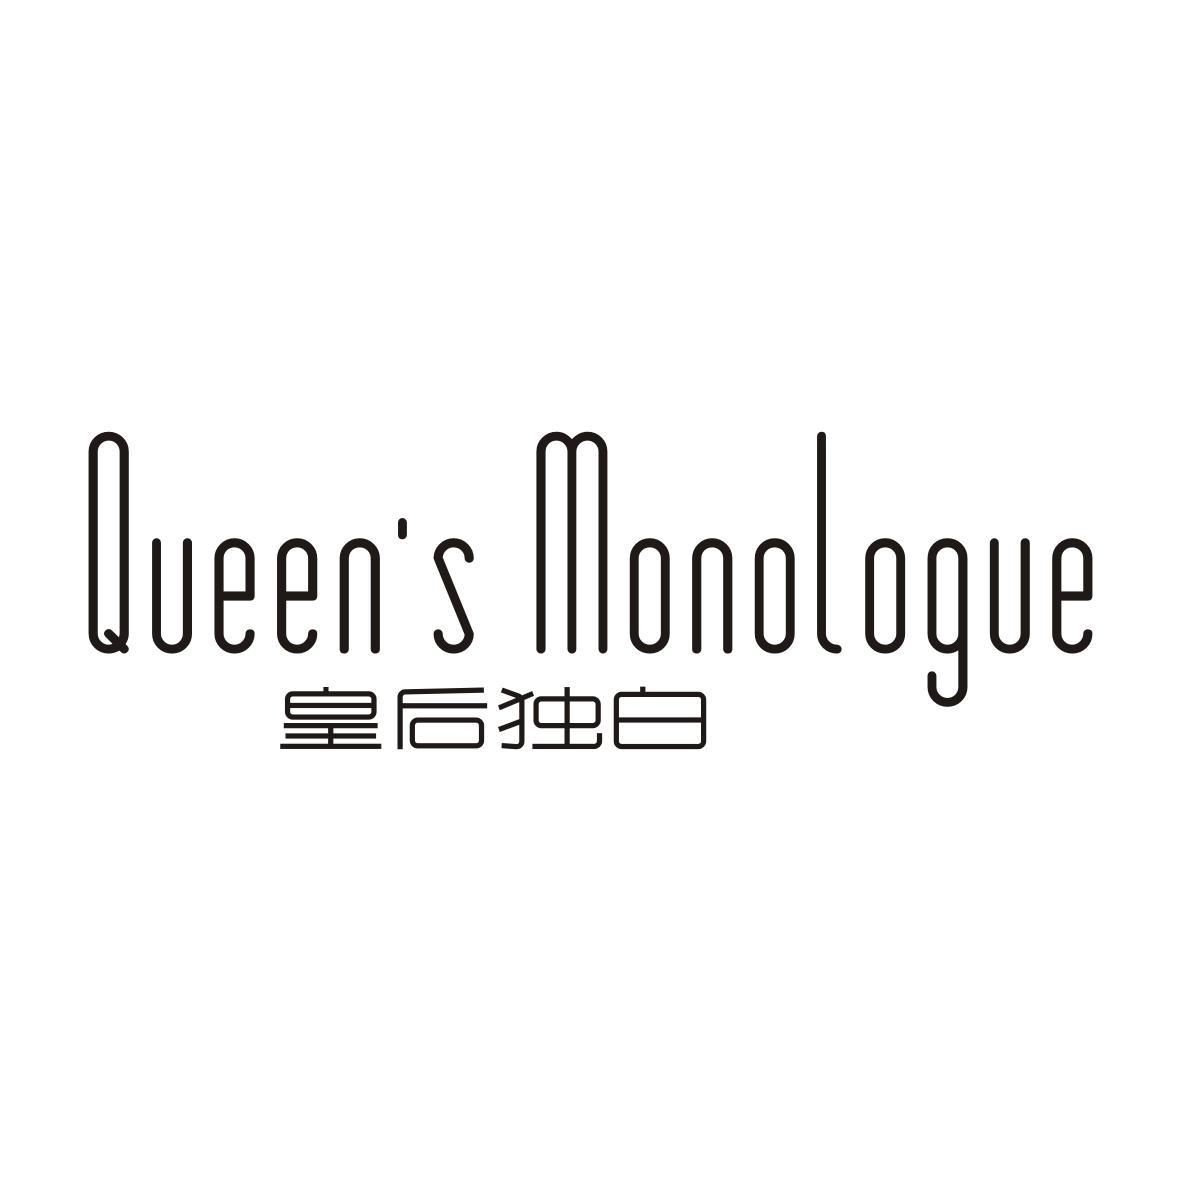 转让商标-皇后独白 QUEEN'S MONOLOGUE